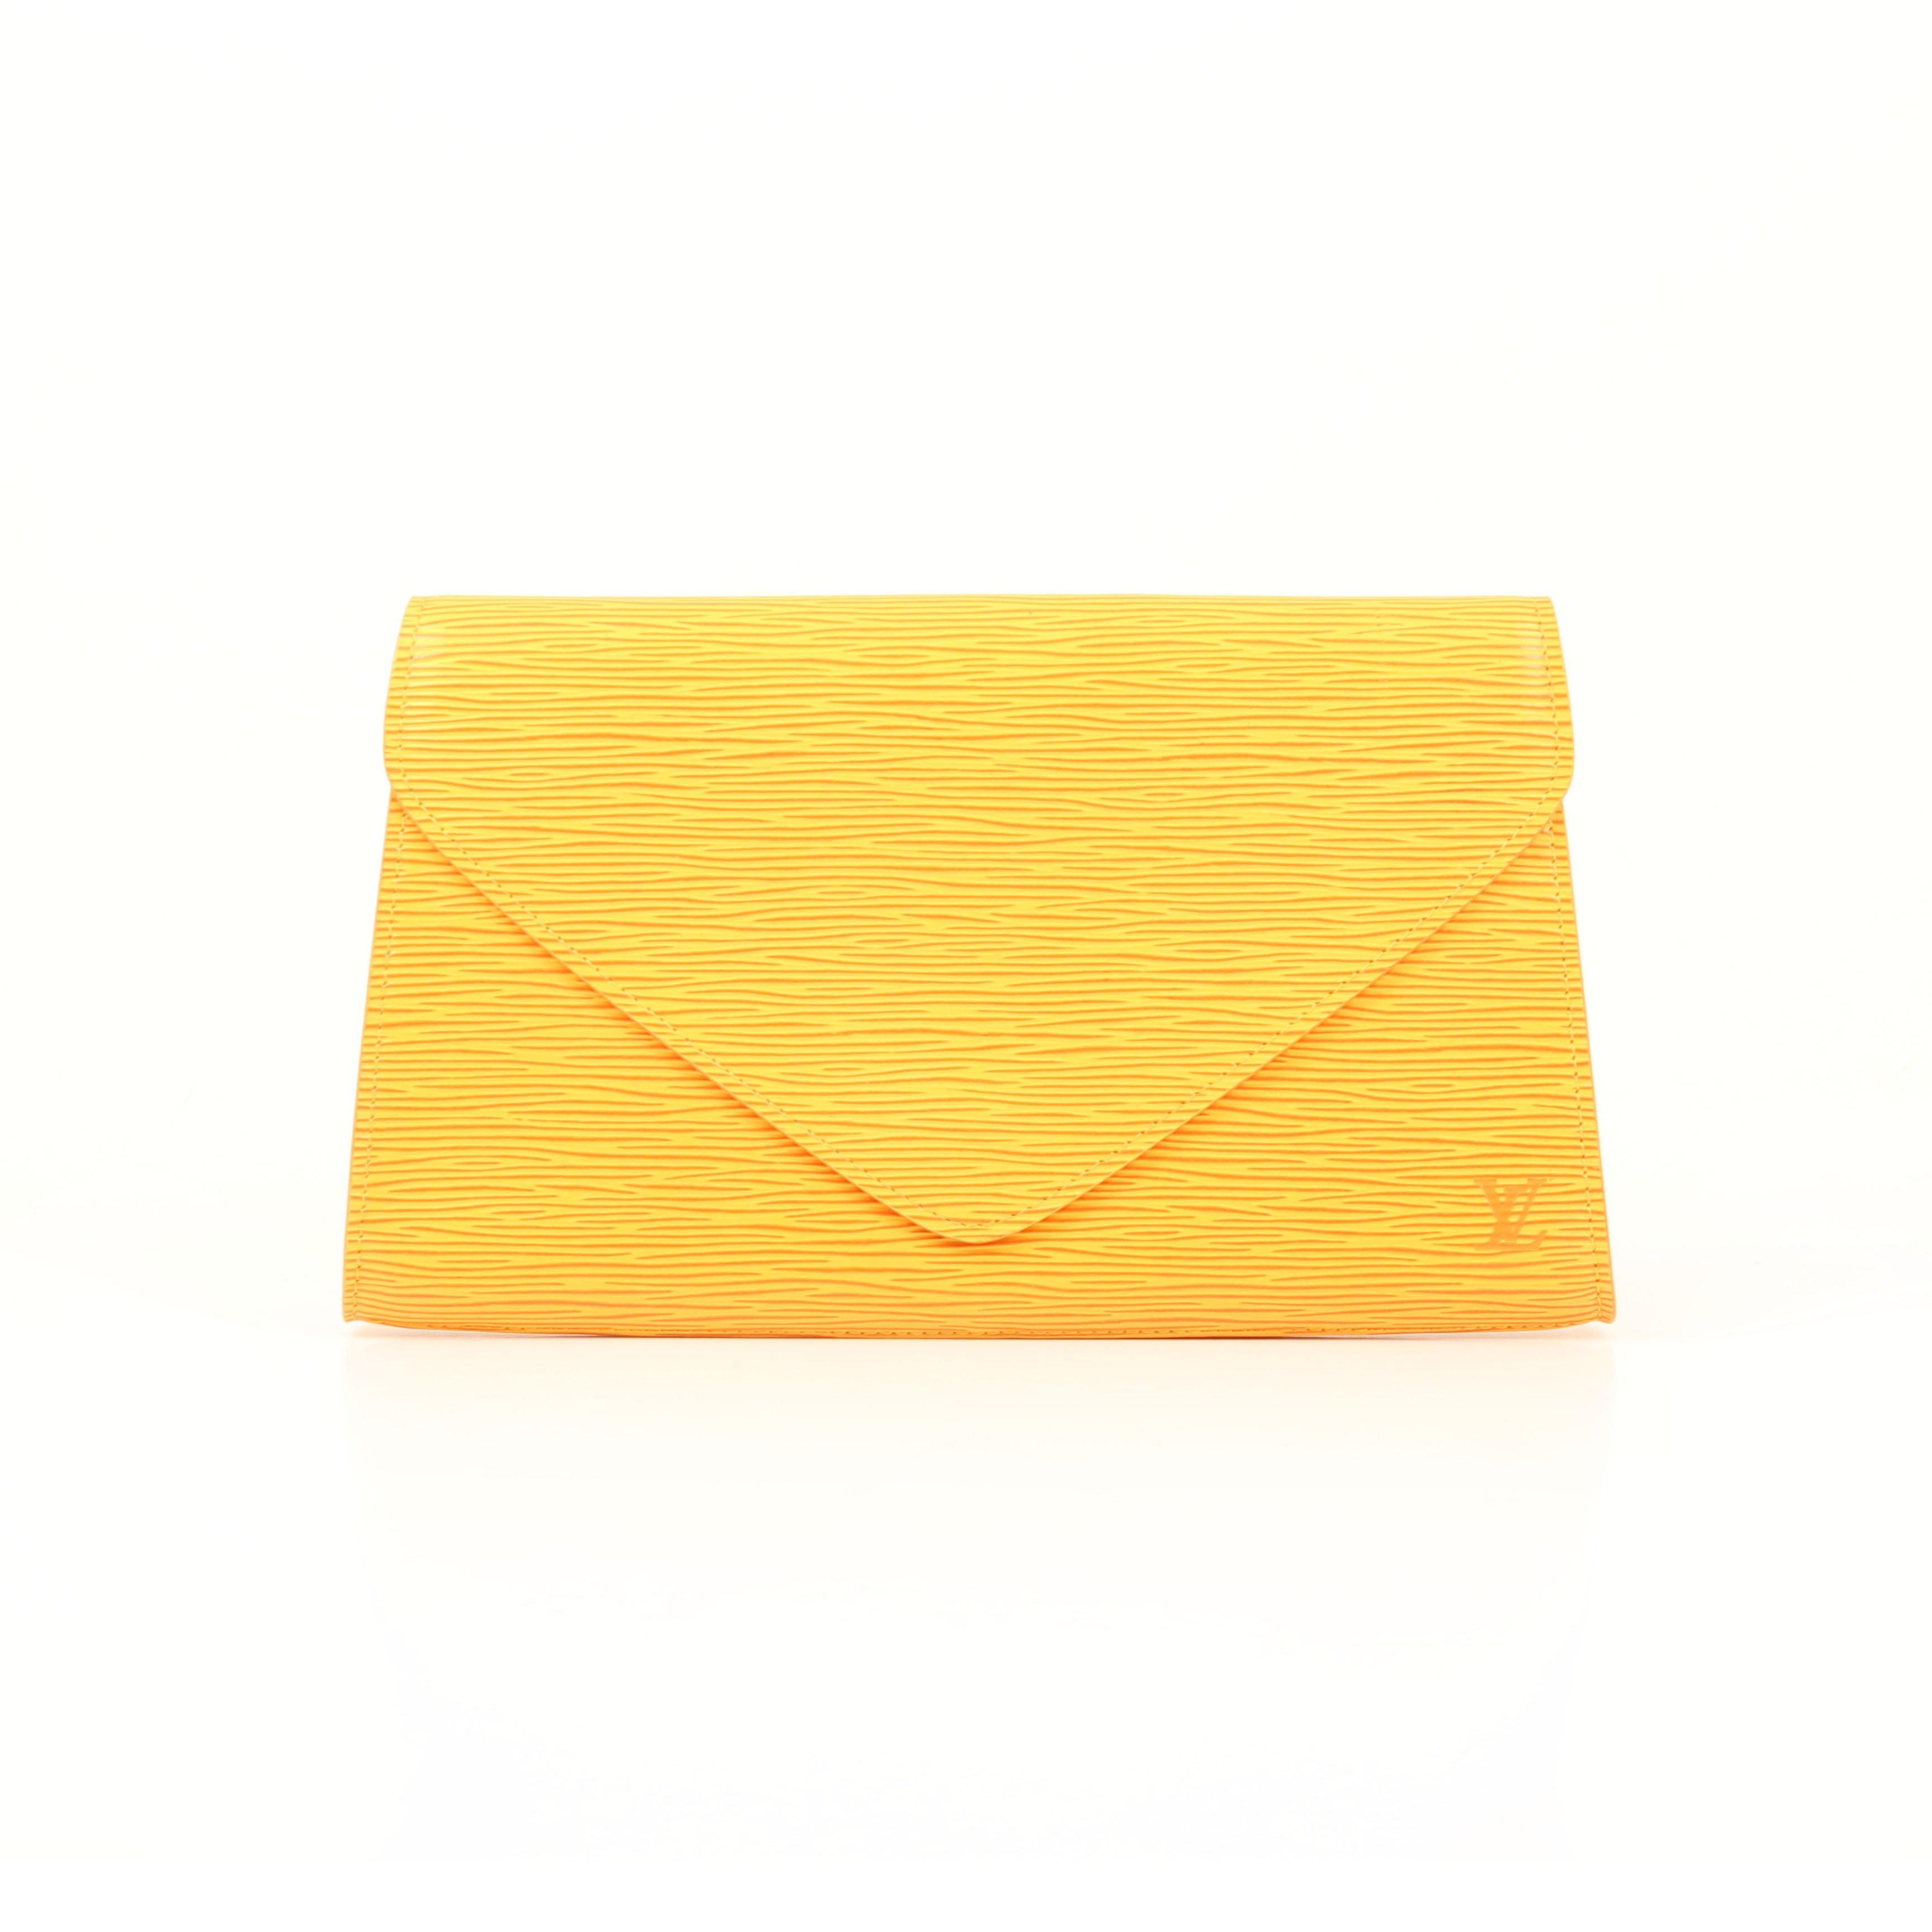 clutch louis vuitton vintage epi yellow